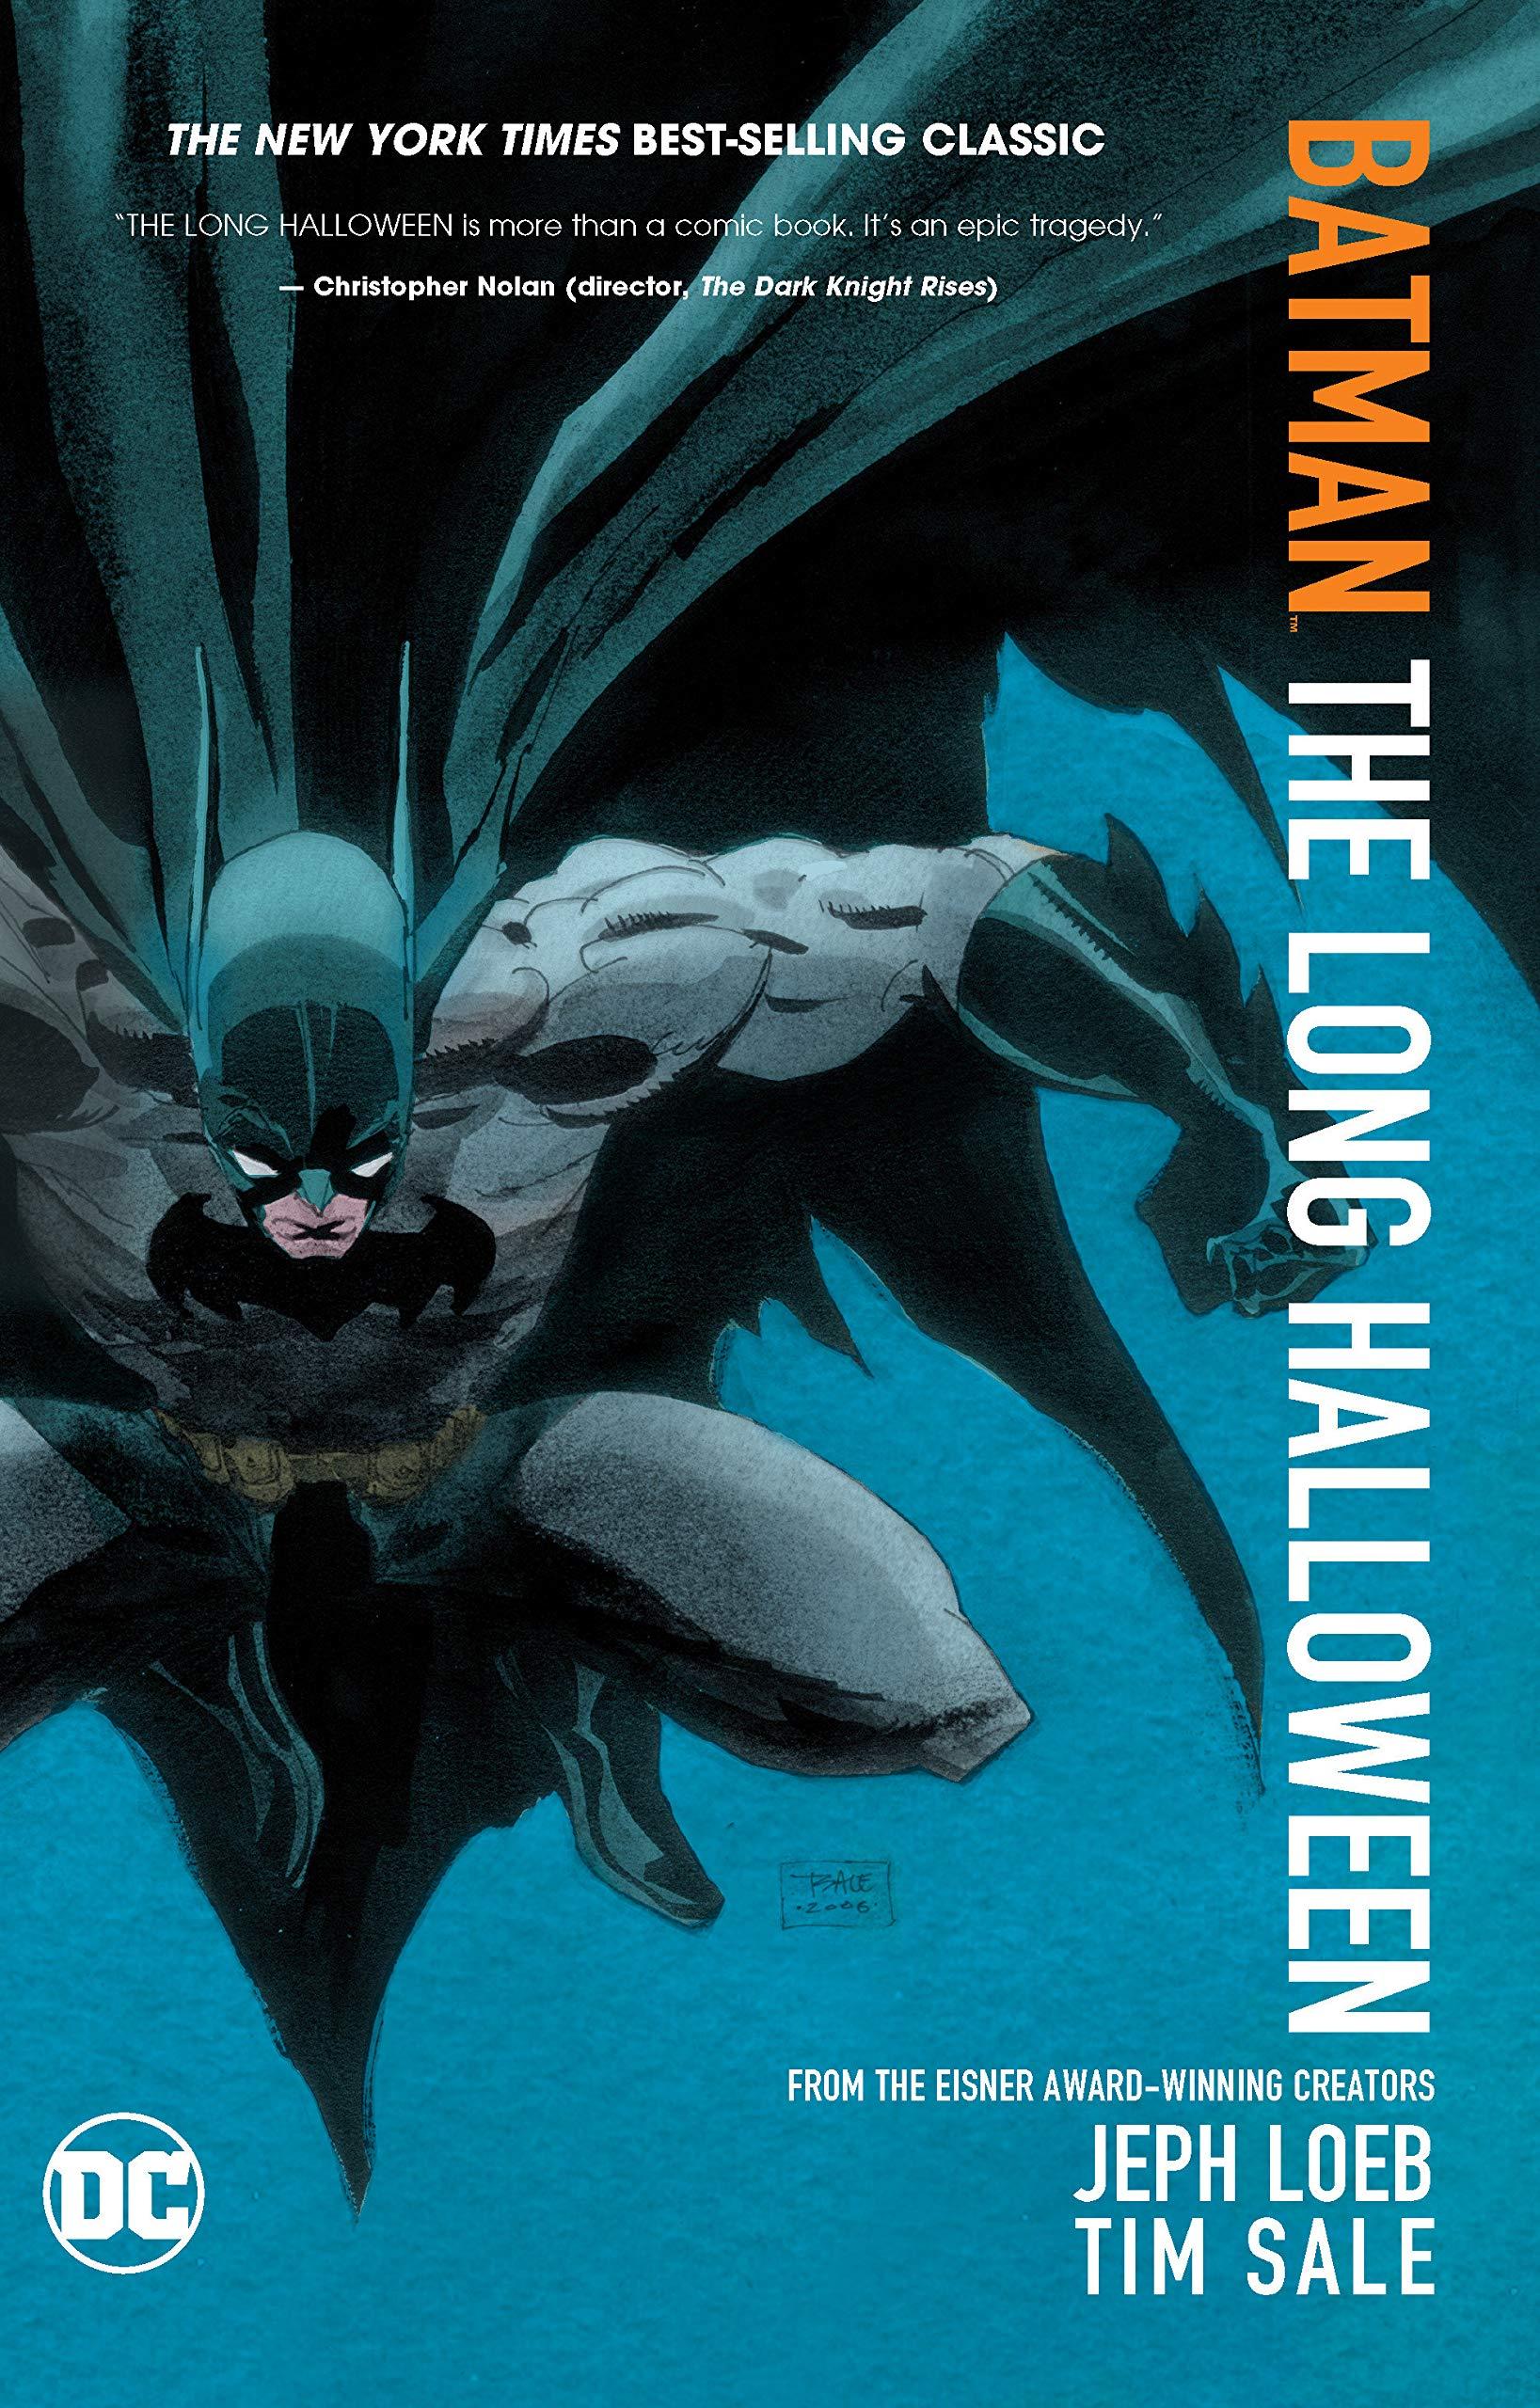 The Long Halloween Part 1 Issue 17 New DC Comics Graphic Novel Marvel Batman